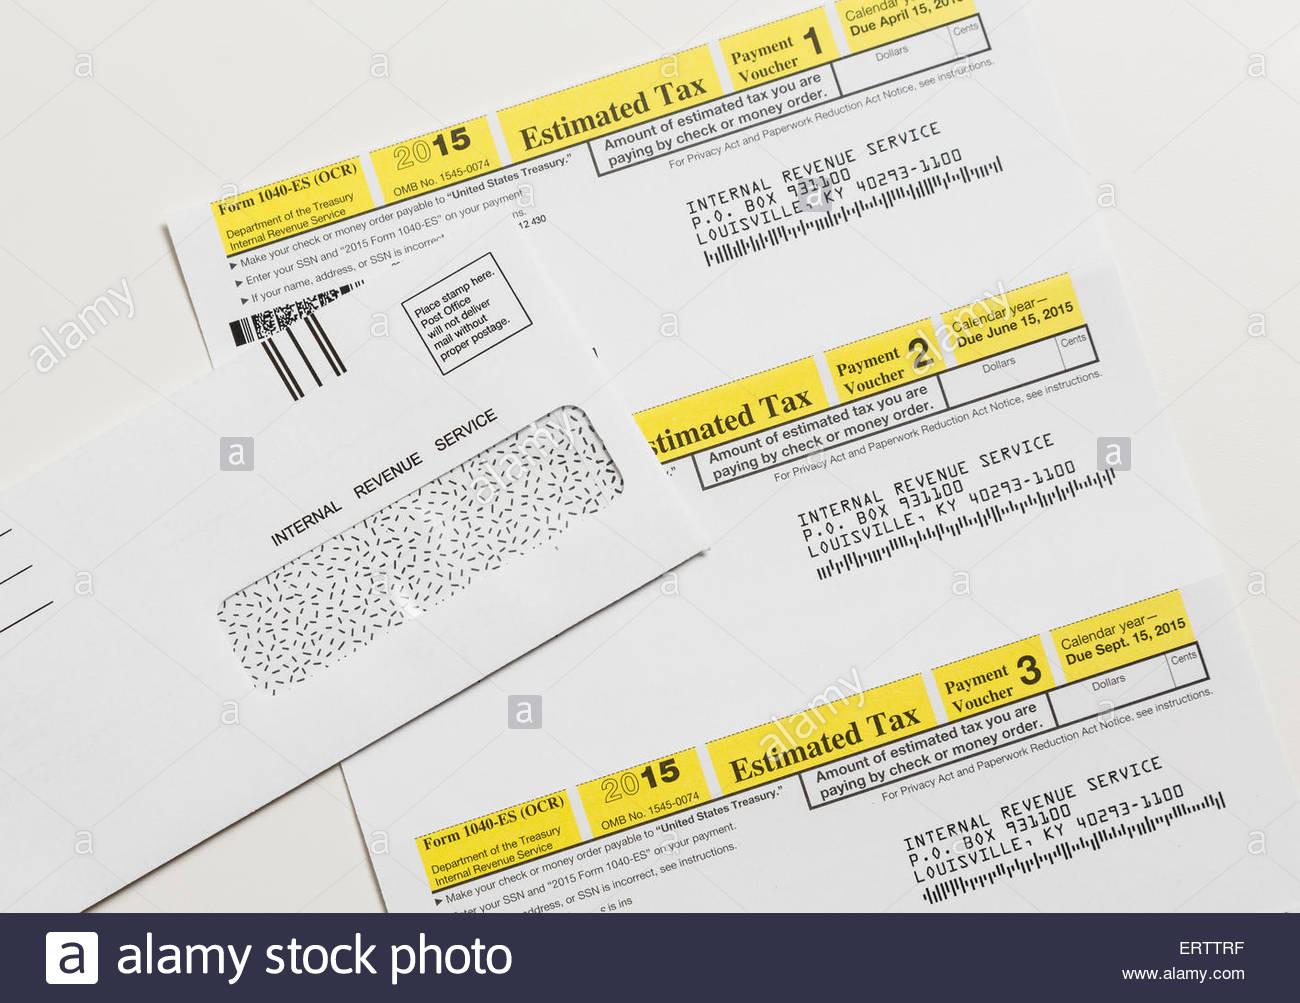 Es Spreadsheet 1 Printable Spreadshee Es